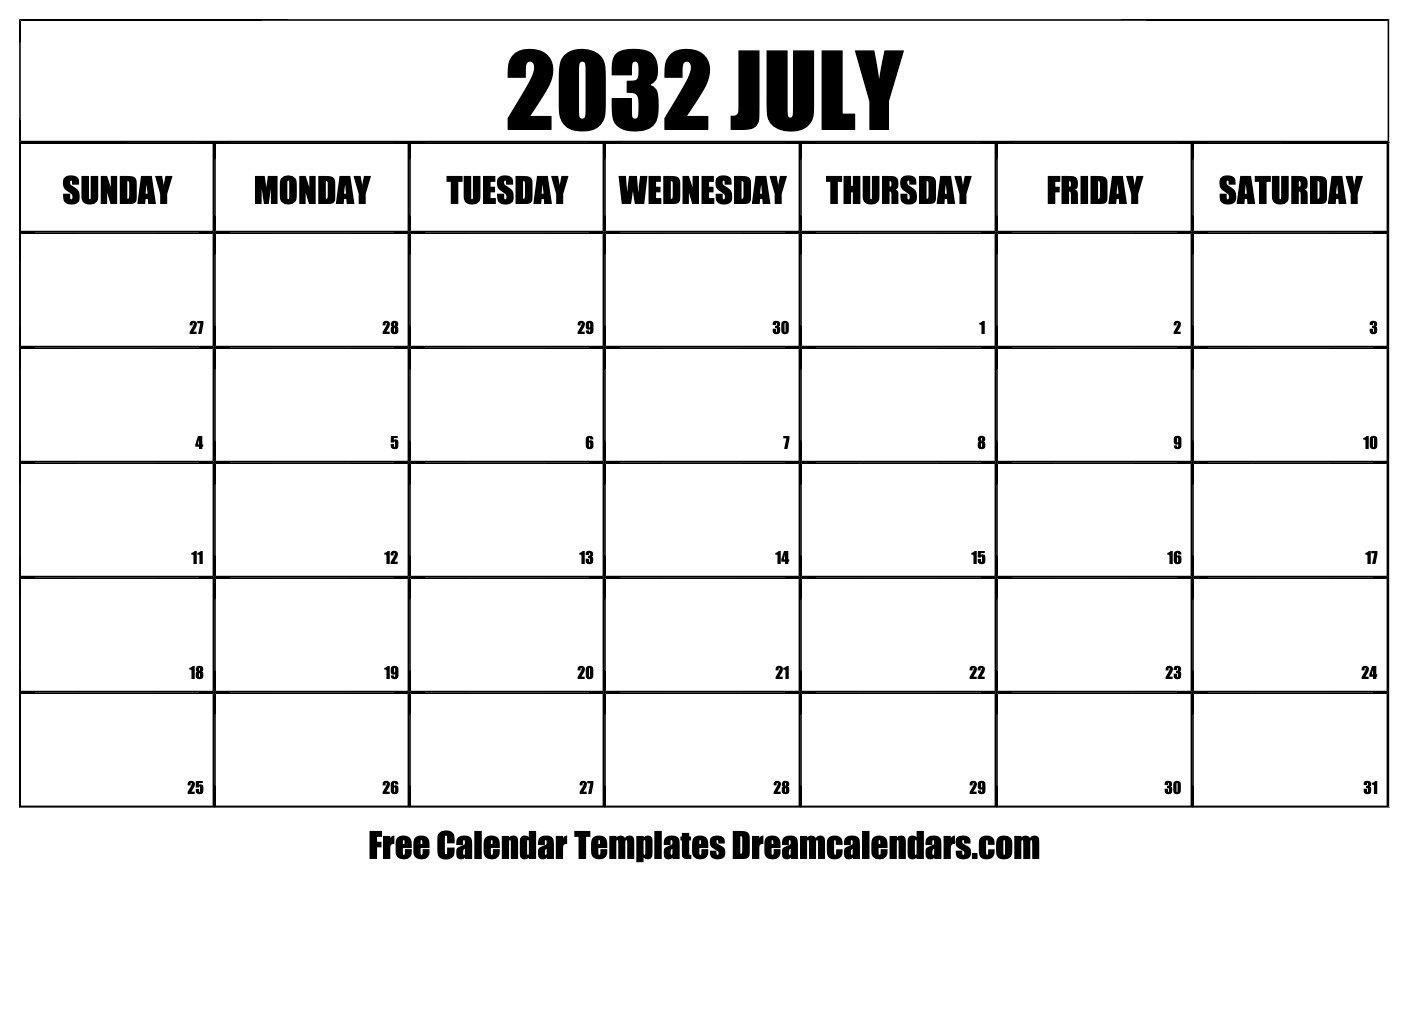 July 2032 Calendar | Free Blank Printable Templates Free Bold Printable Calnder Jully